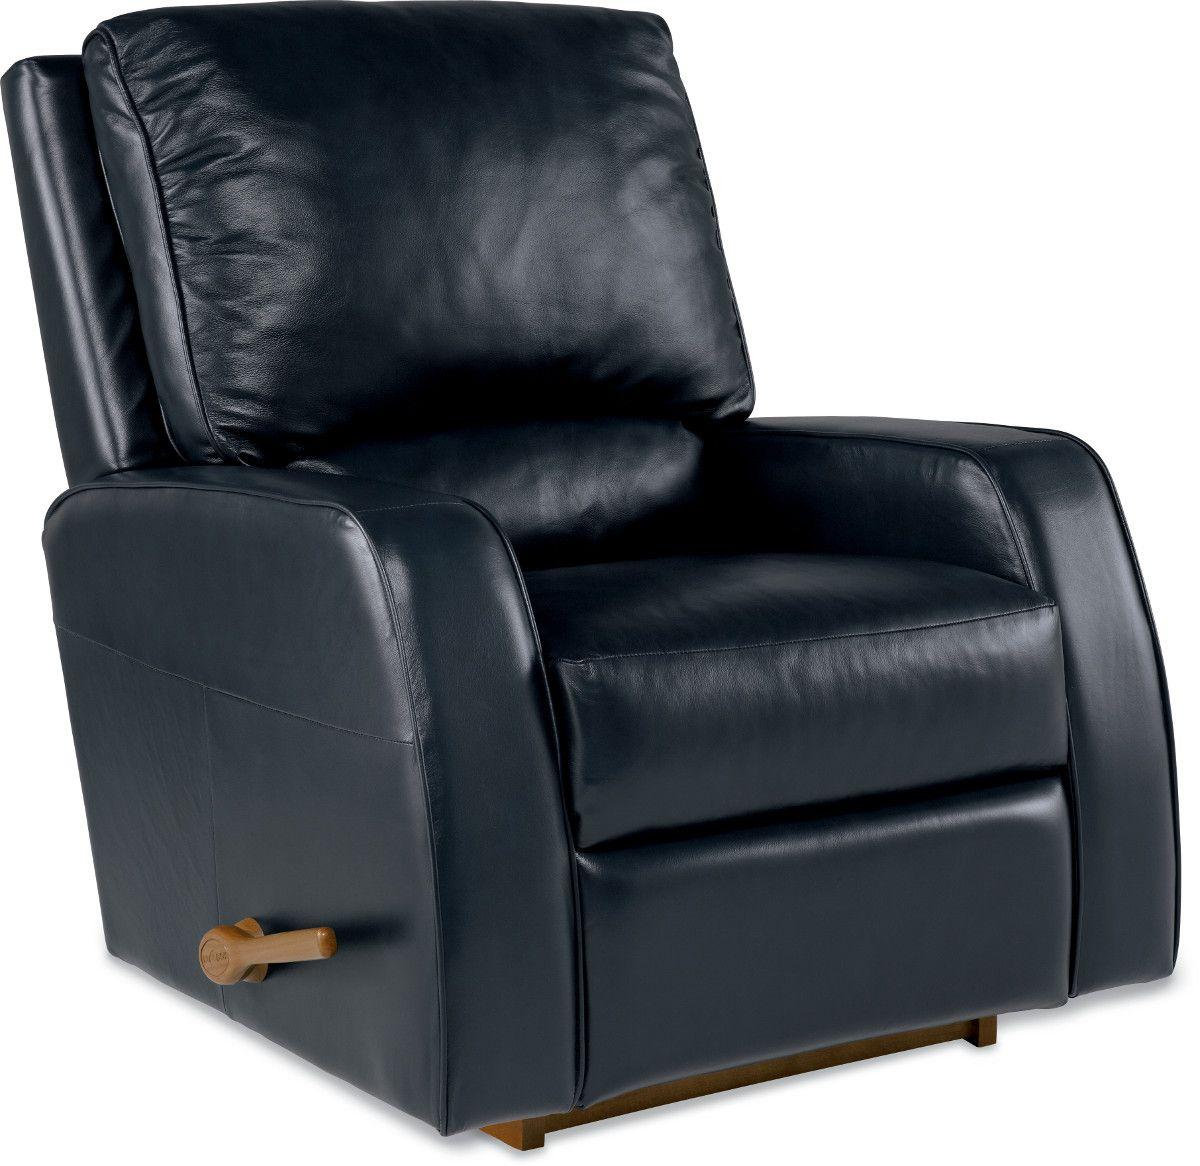 La Z Boy Cool Chair Covers For Sale Port Elizabeth Cole Reclina Rocker Recliner Recline Awhile